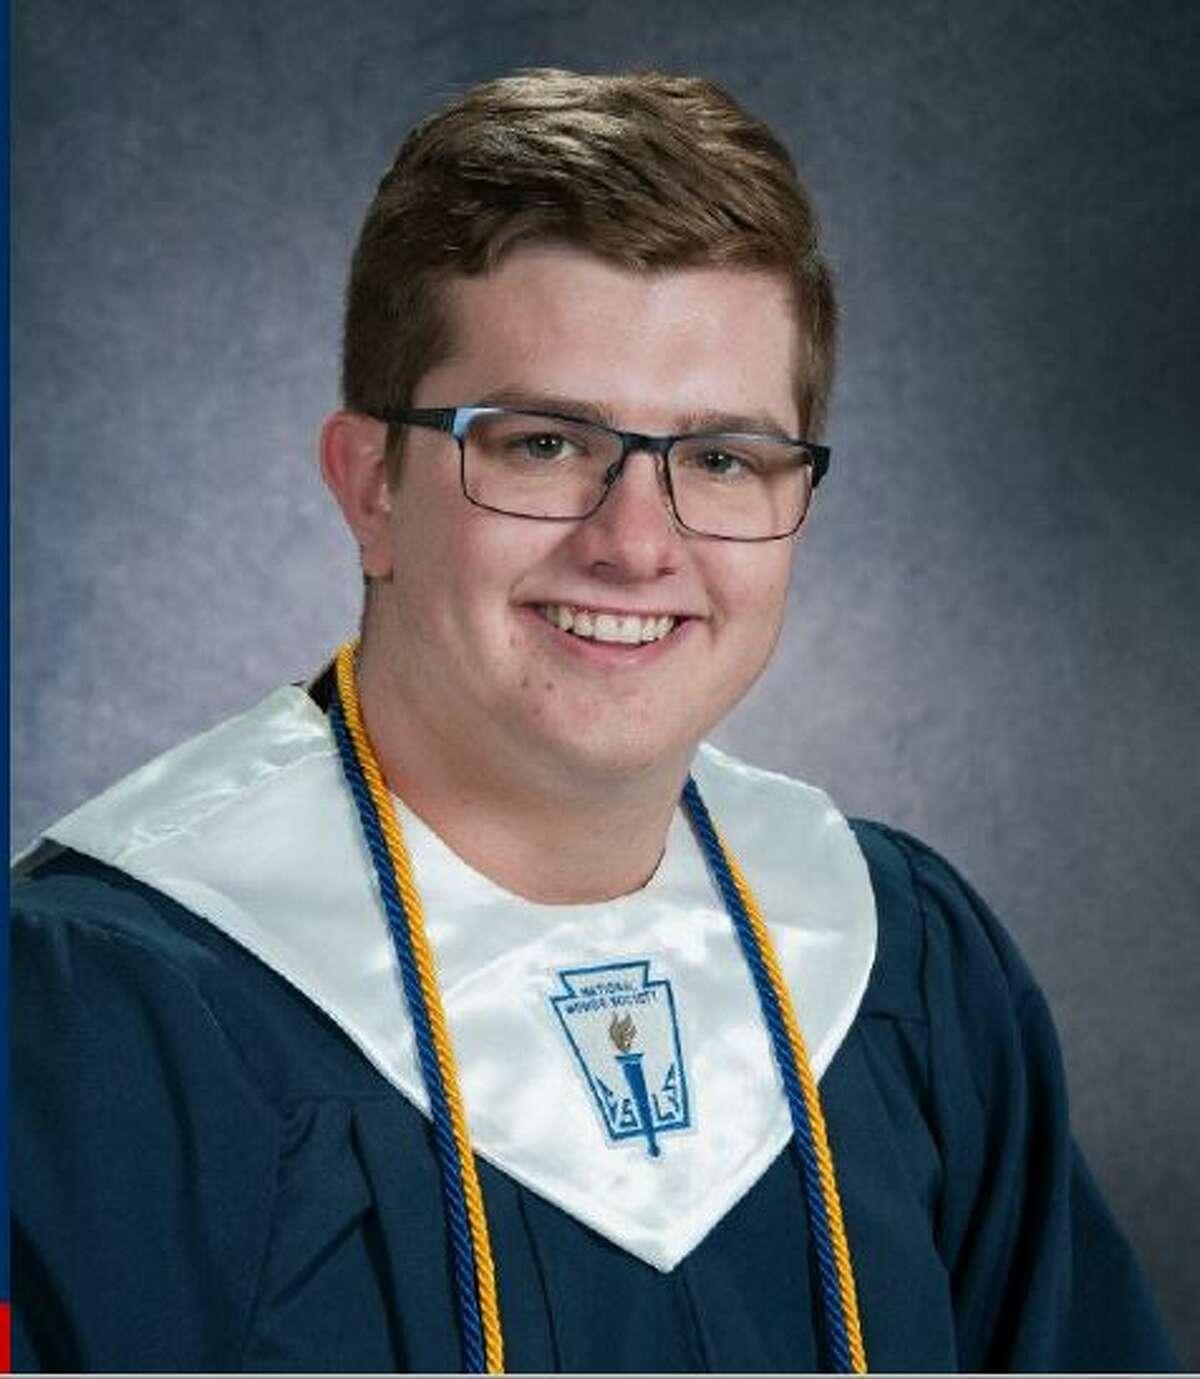 Mitchell Sims, Plainview High School Class of 2020 salutatorian